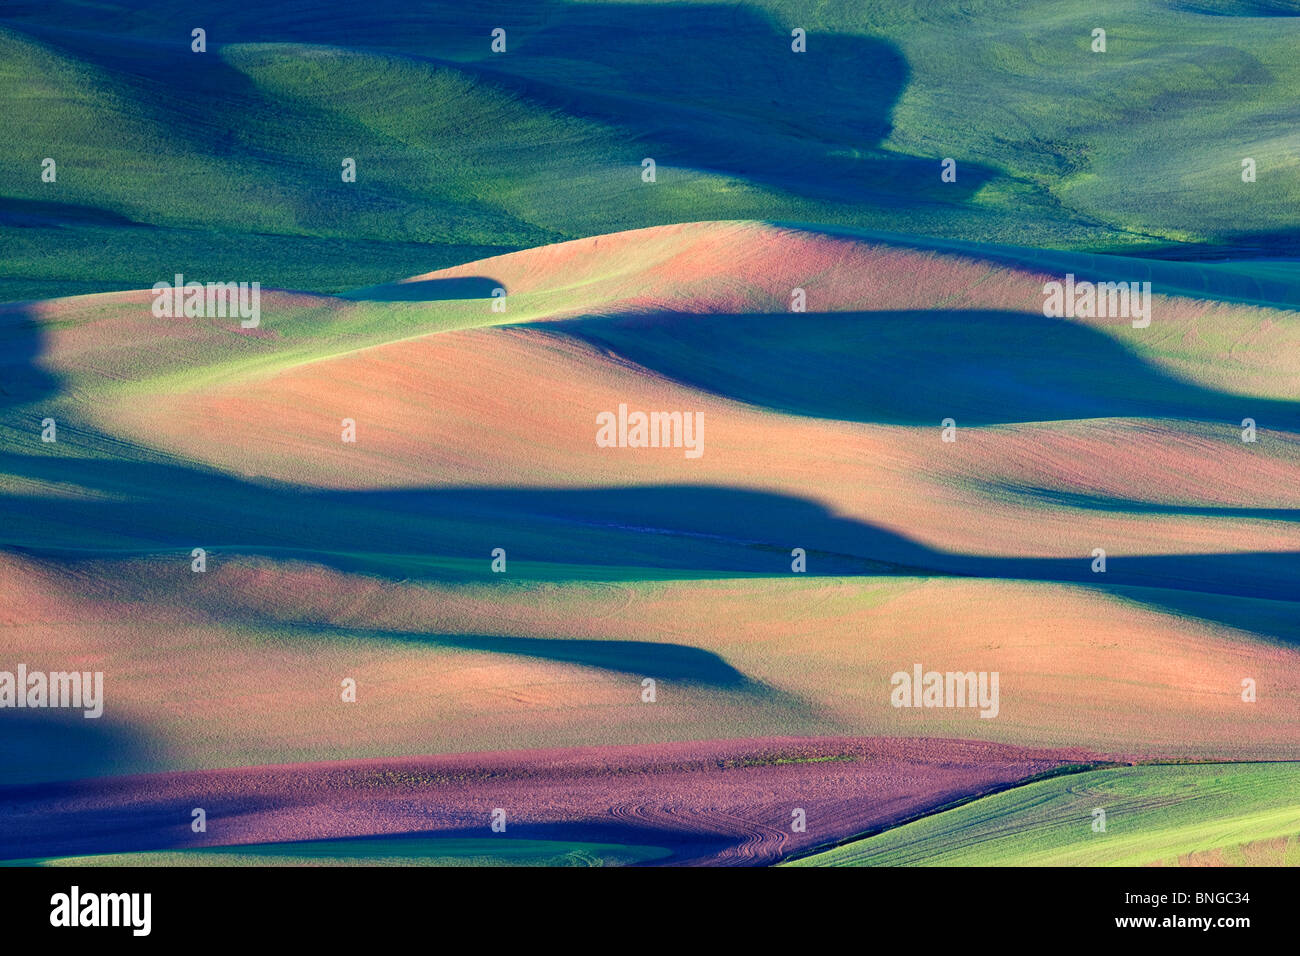 New spring wheat growth. The Palouse, near Colfax, Washington. Stock Photo